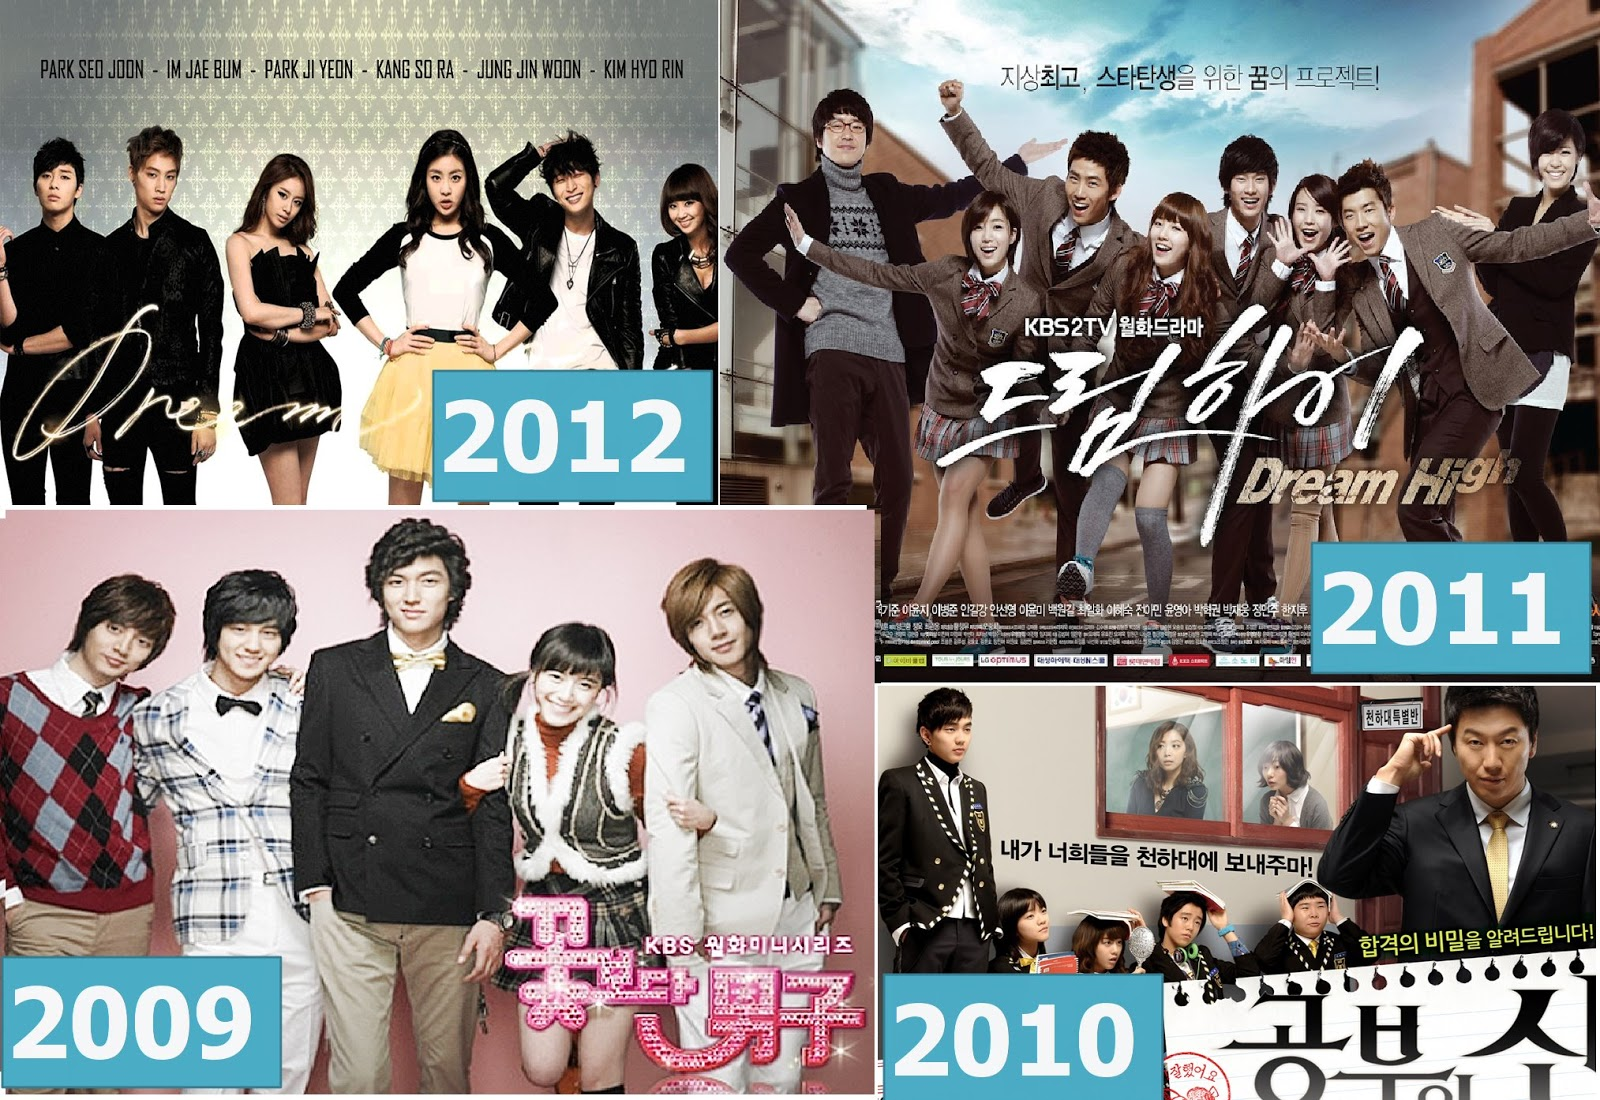 [Info] Kim Hyun Joong Boys Over Flowers will on KBS2 s special drama ev